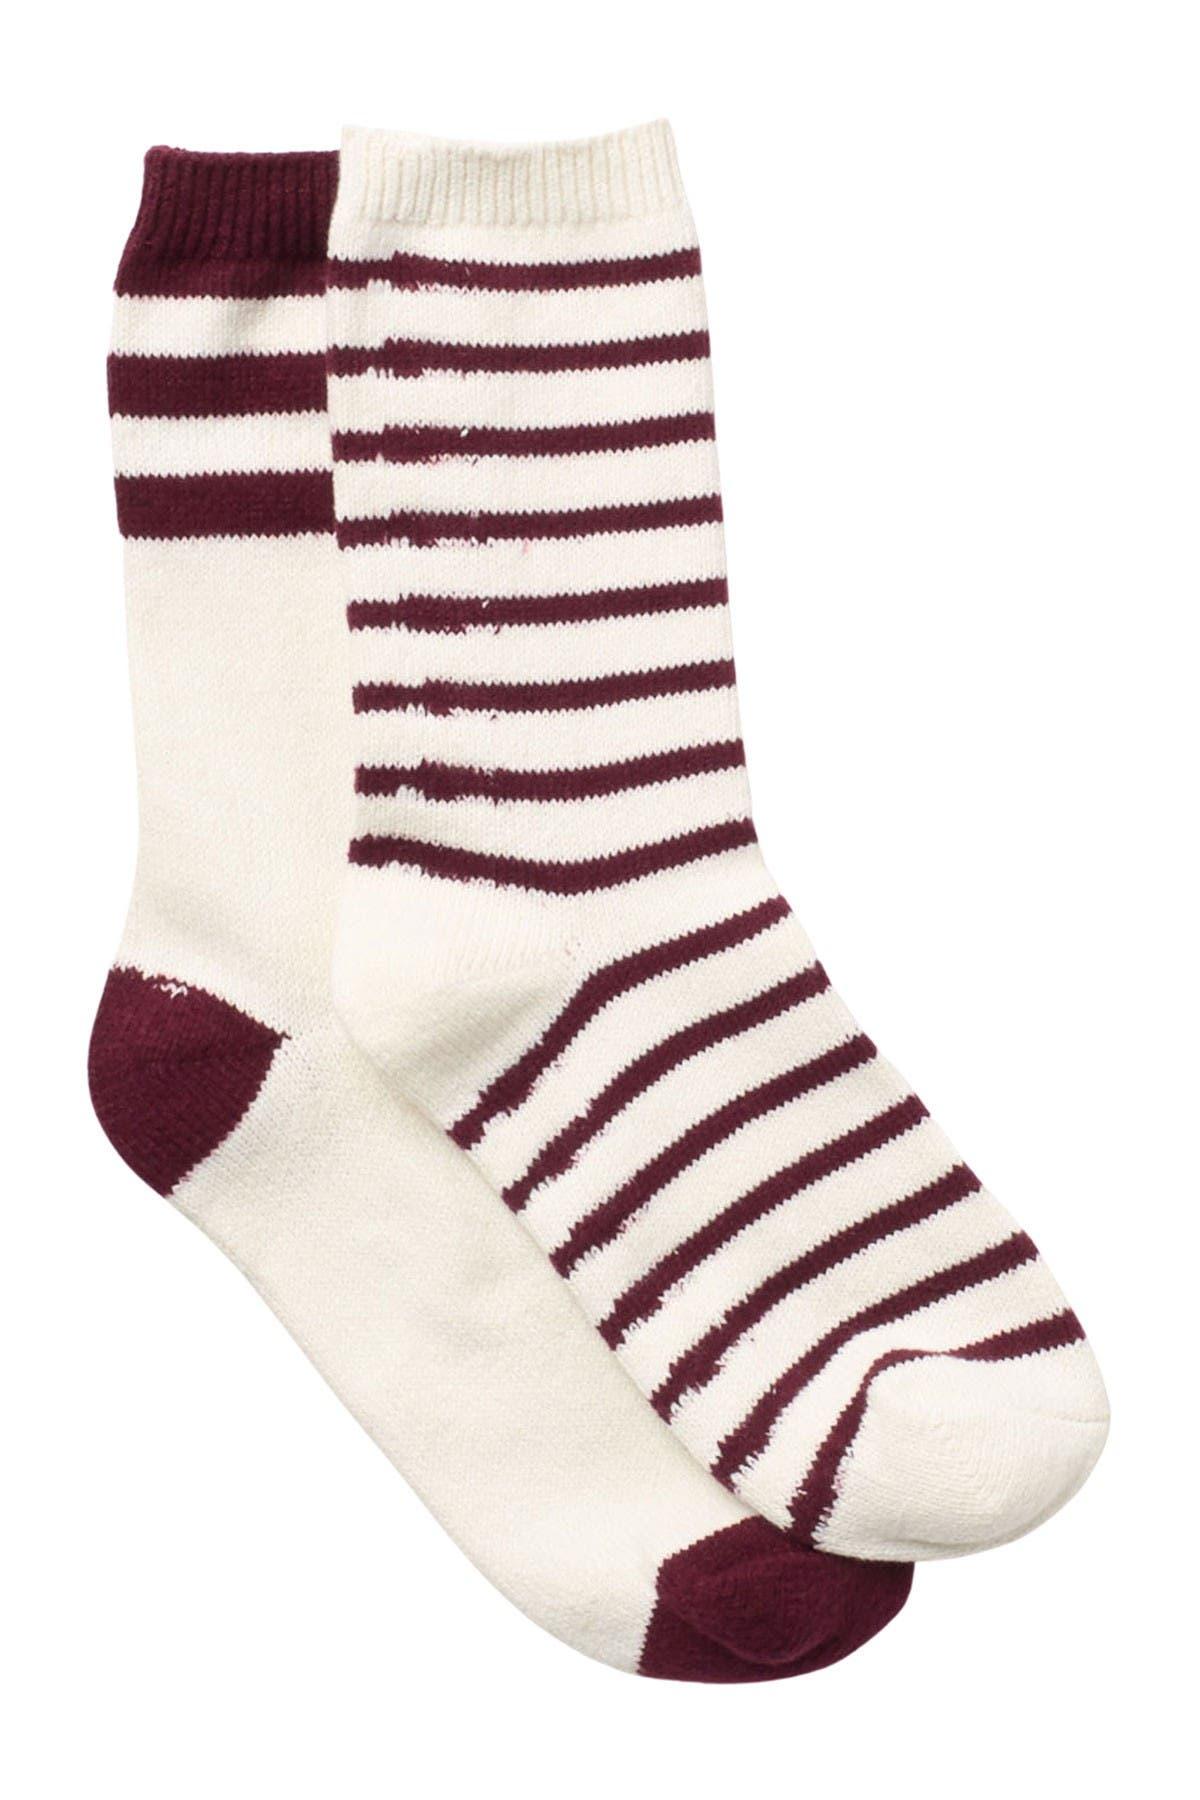 Image of Jessica Simpson Stripe Crew Socks - Pack of 2